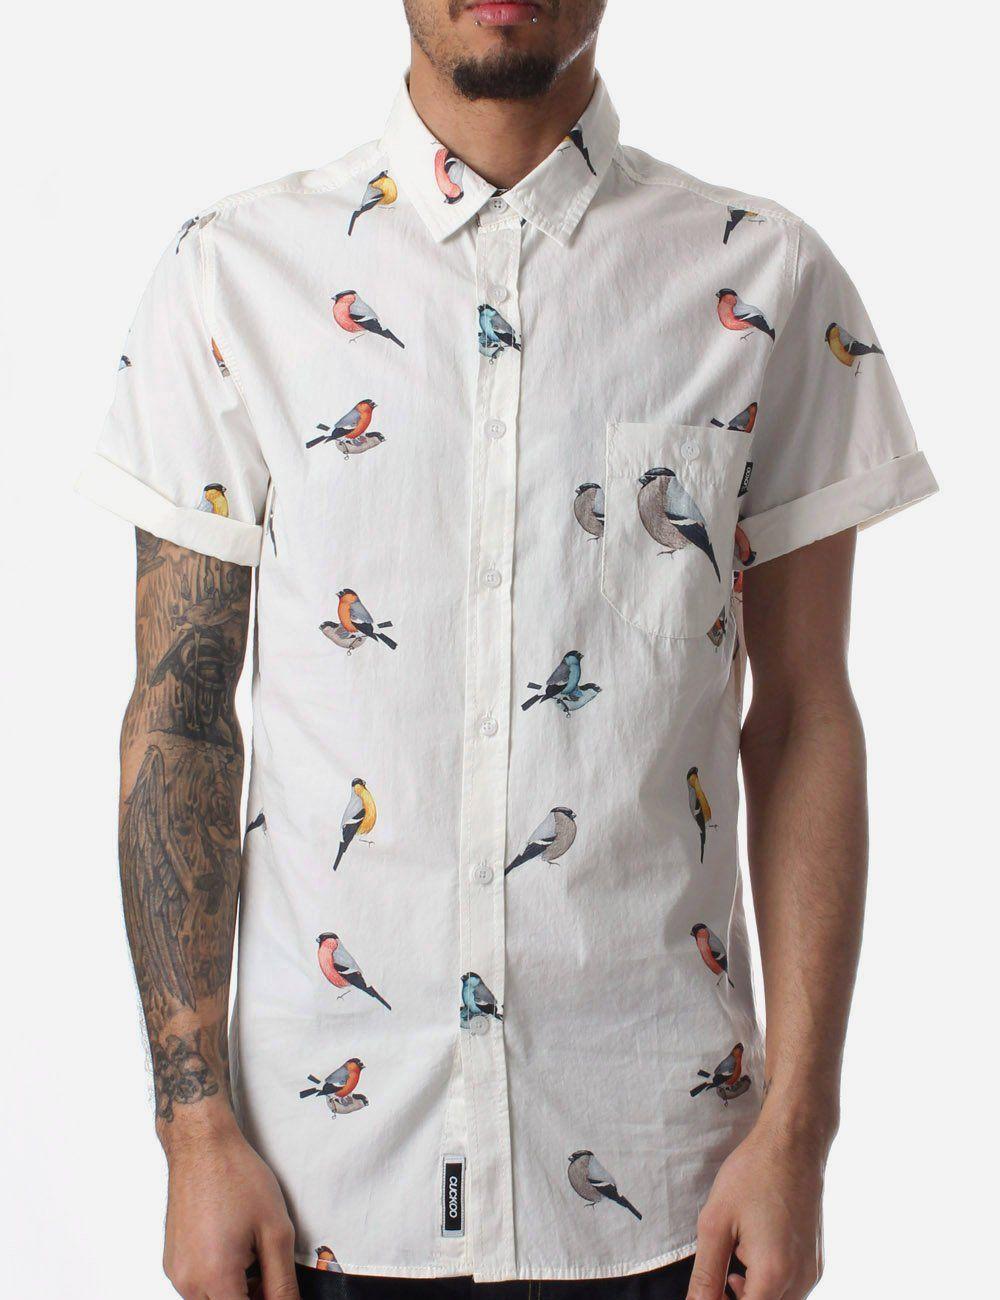 e8f1780f7 All Over Bird Print Men's T-shirt Off White in 2019 | Bird Print ...